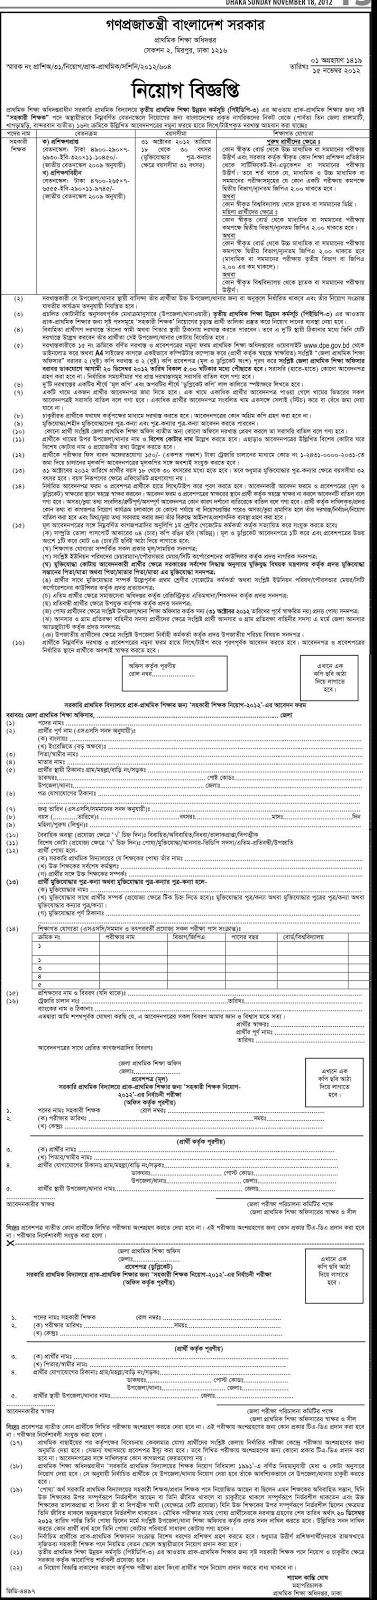 Primary Education Recruitment-2012